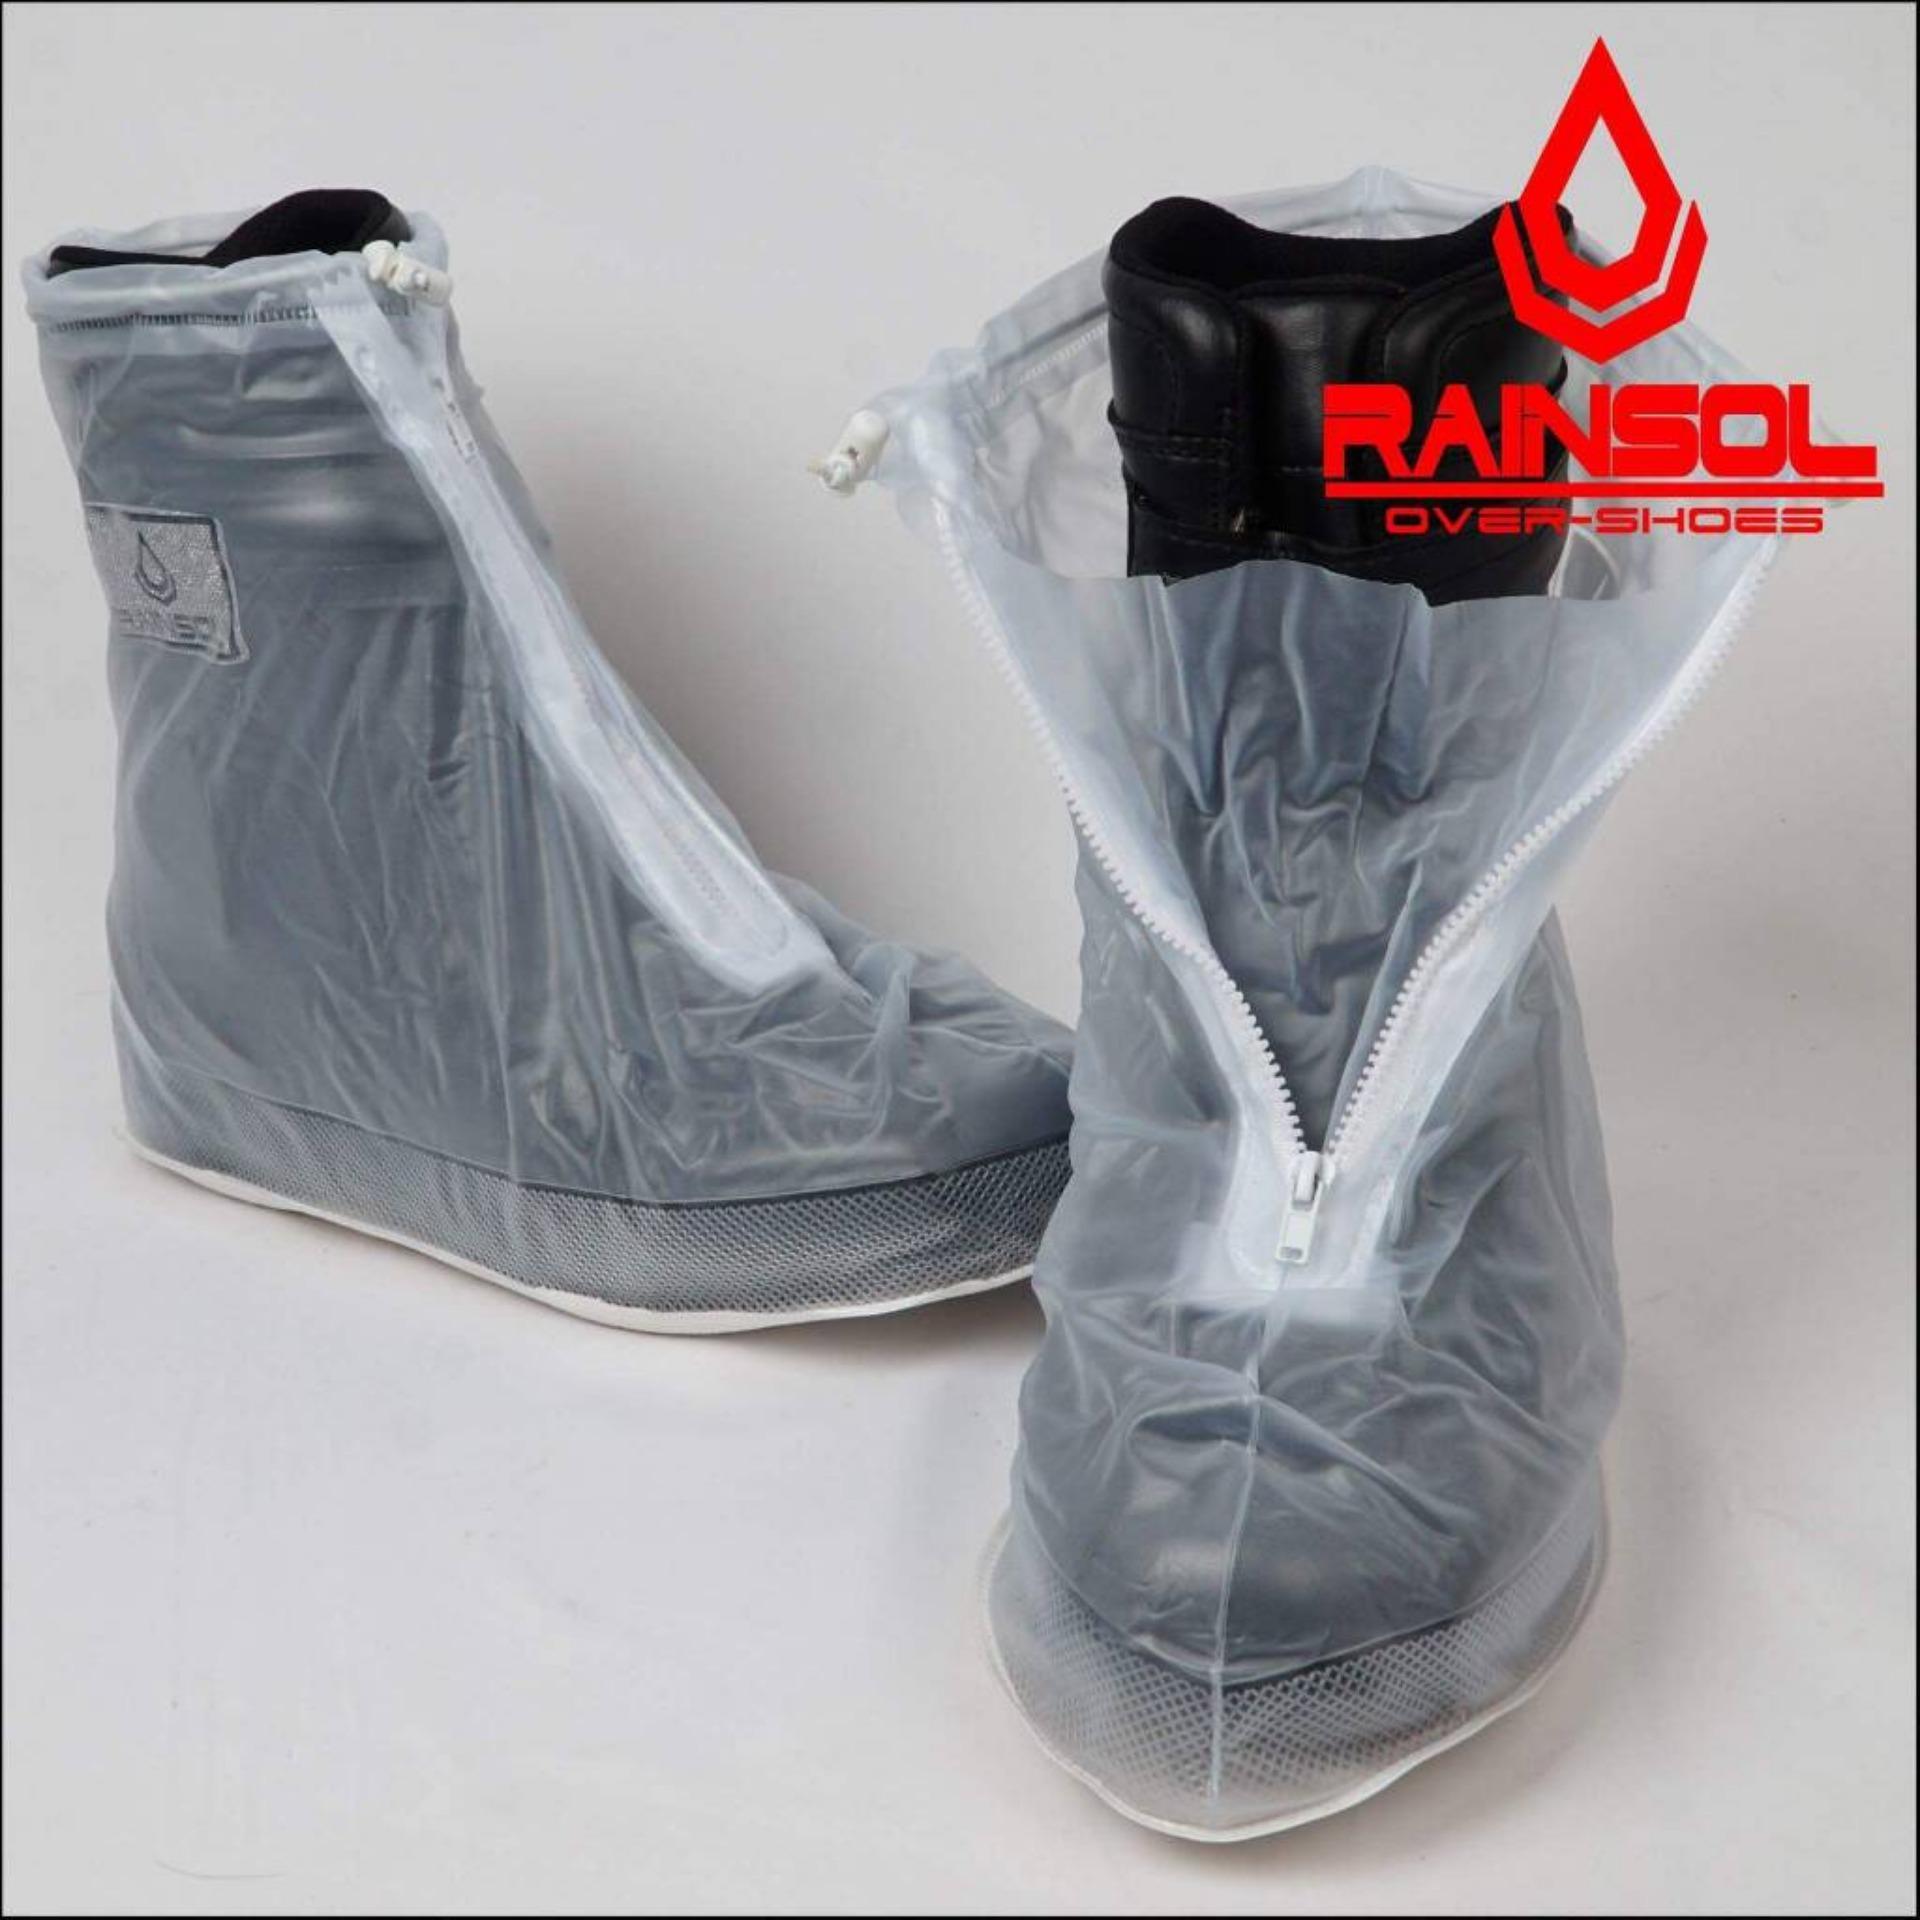 Hot Deals Rain Cover Shoes Rainsol Sarung Jas Hujan Sepatu Plastik Car Rear Mirror Guard Mika Pelindung Spion Mobil Dari Pvc